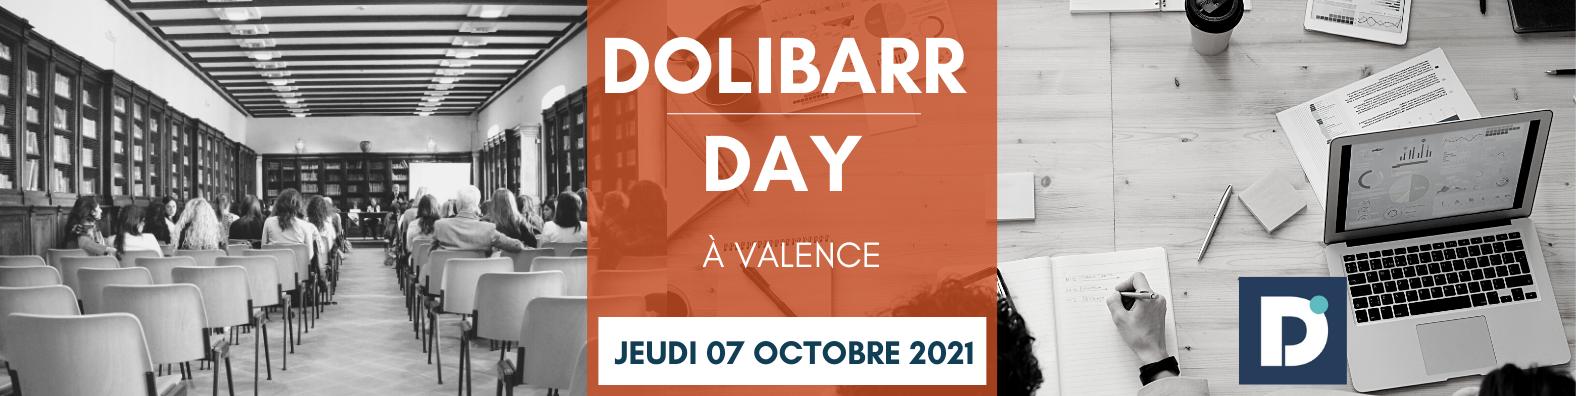 Inscription Dolibarr Day